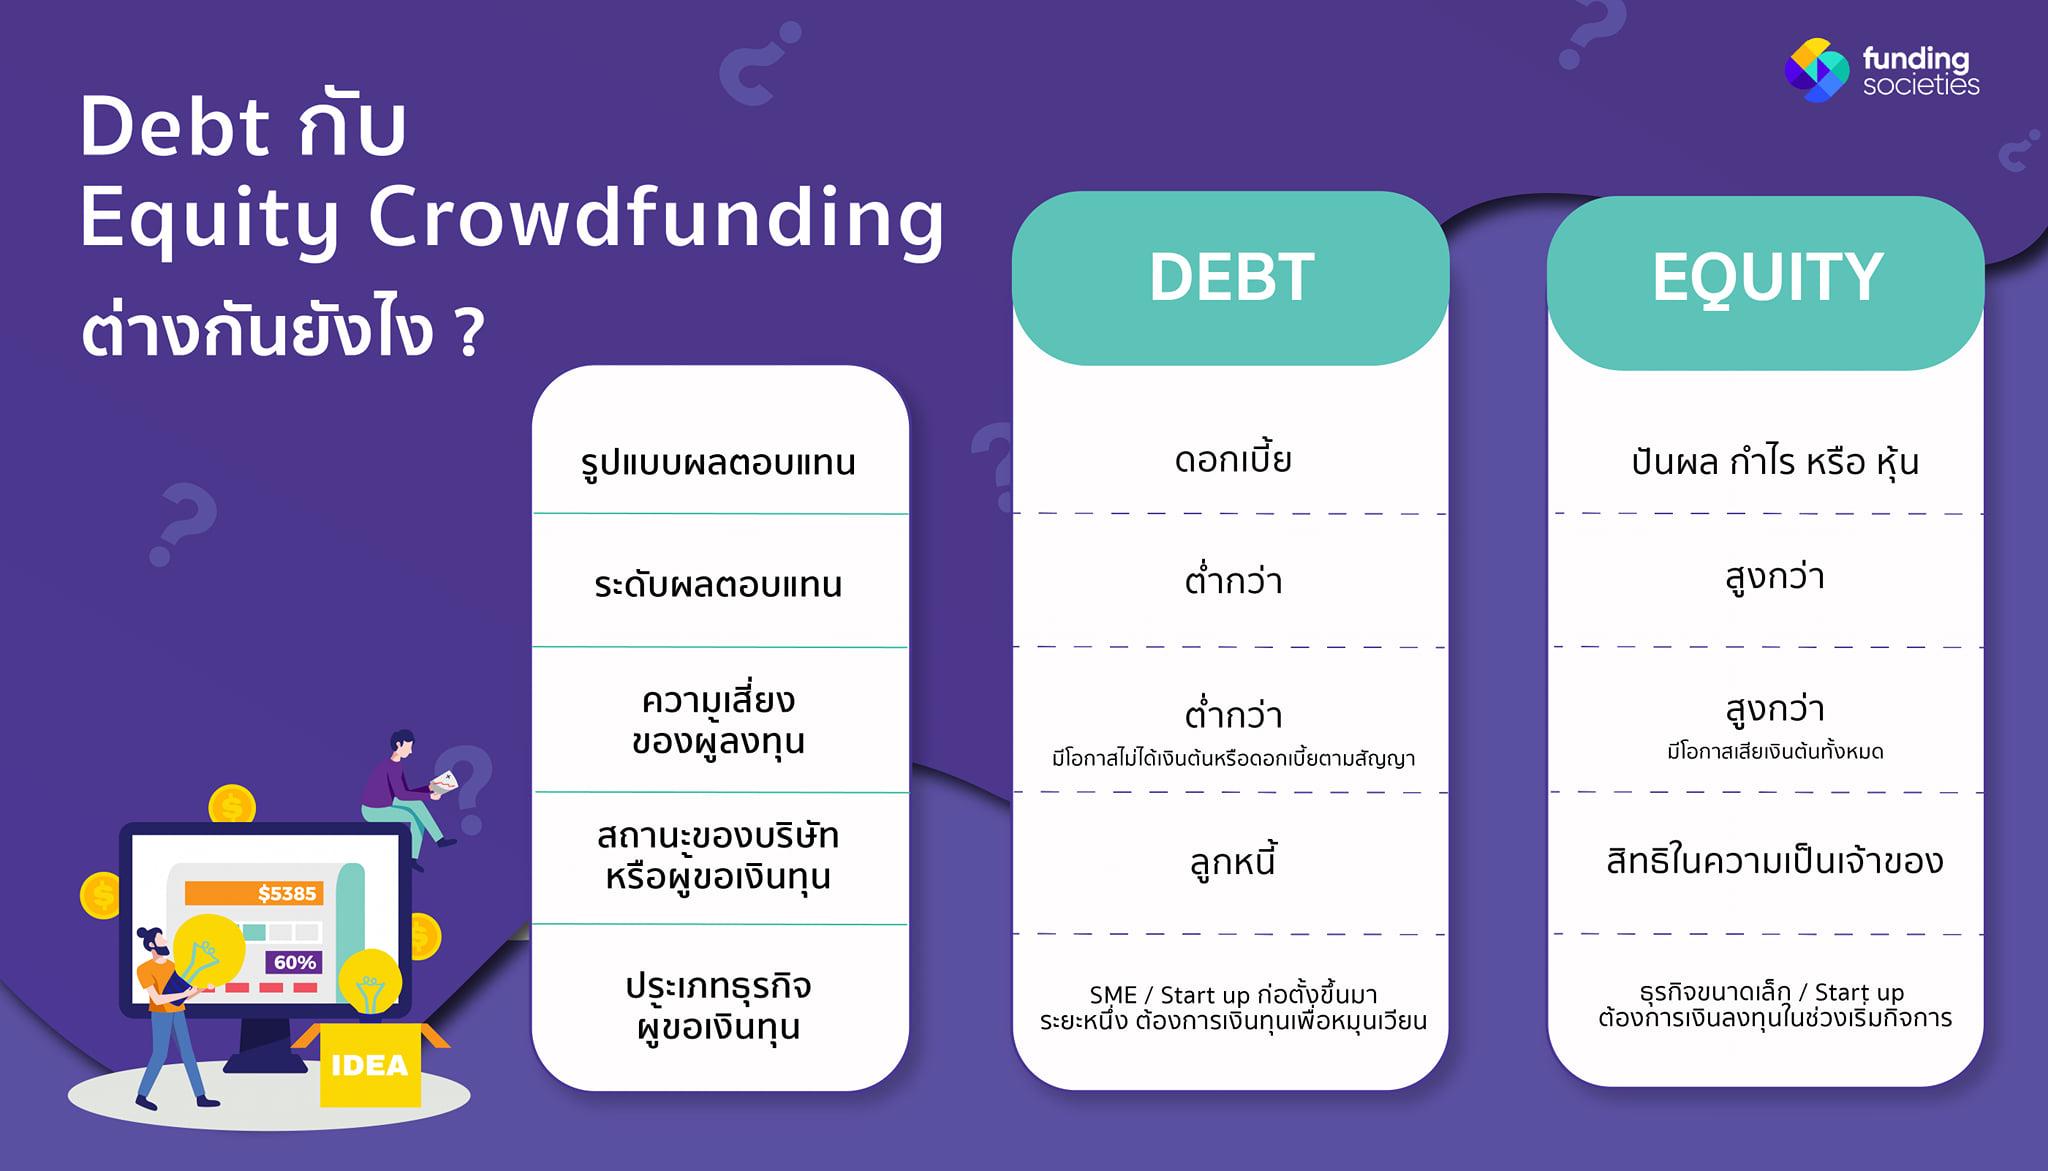 Debt กับ Equity Crowdfunding แตกต่างกันอย่างไร